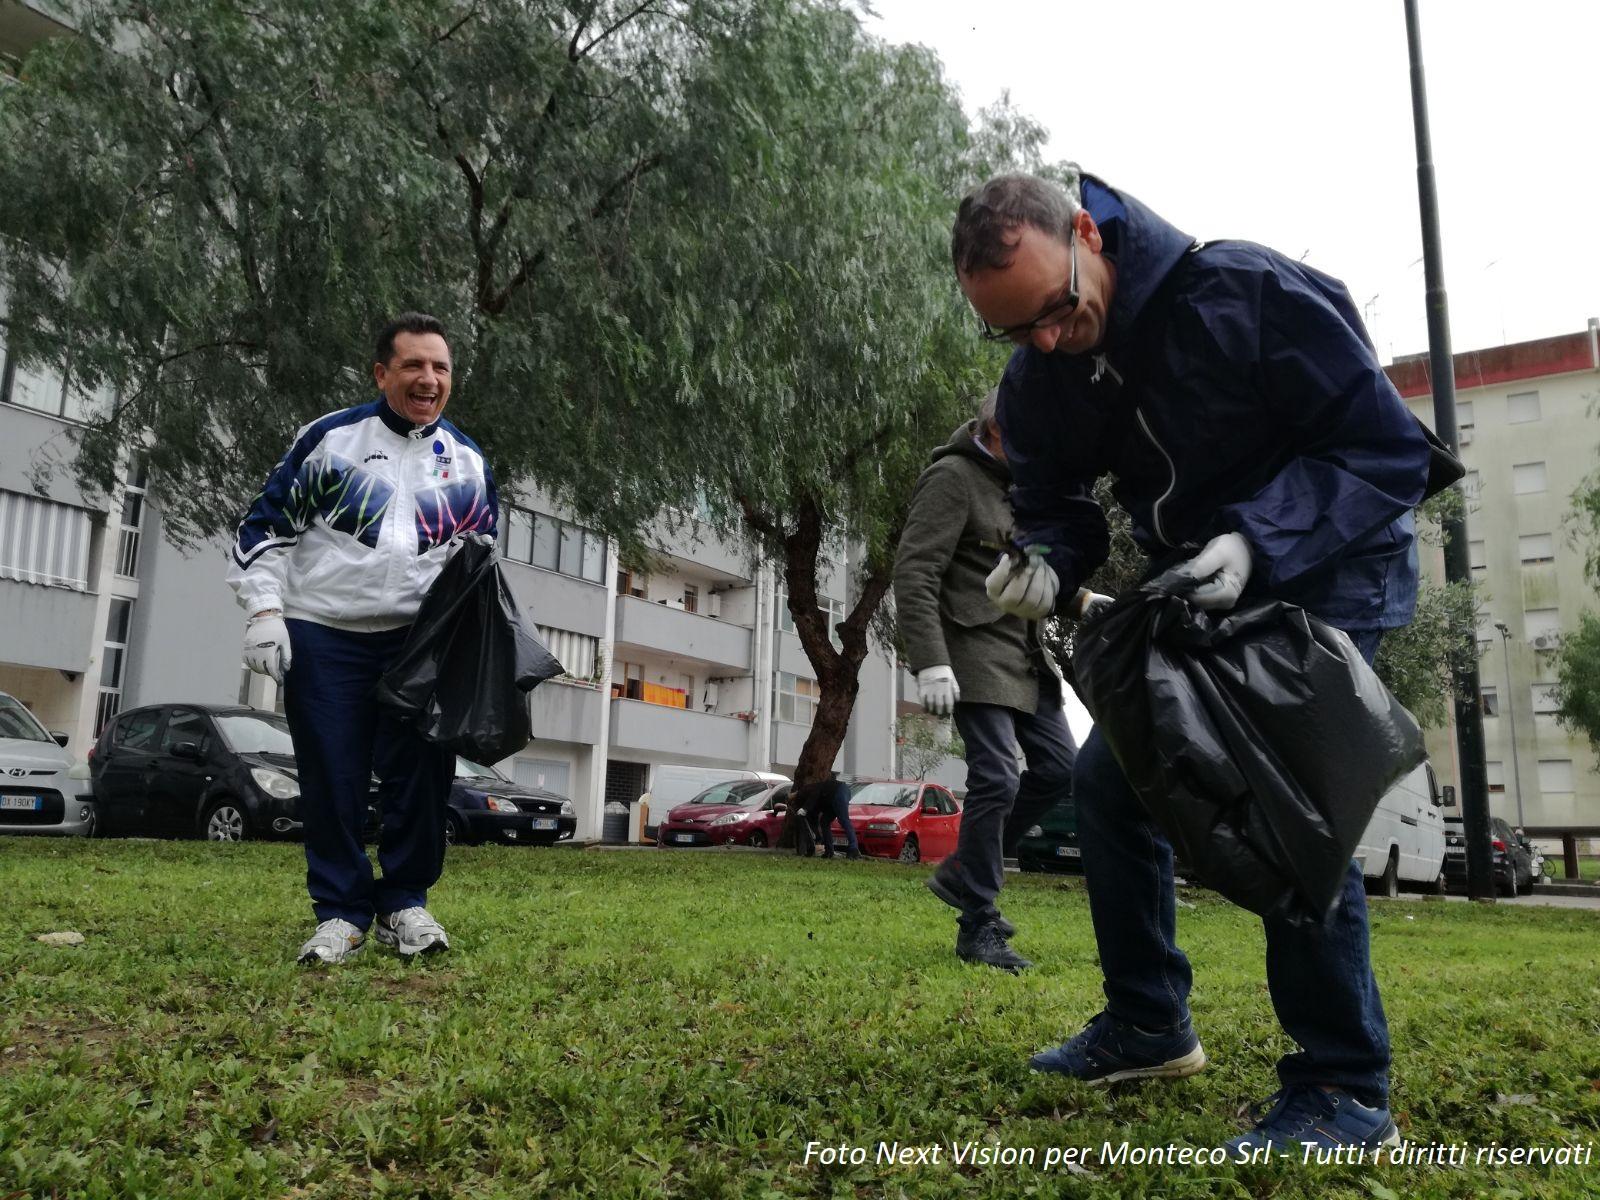 Foto Next Vision per Monteco Srl - Tutti i diritti riservati